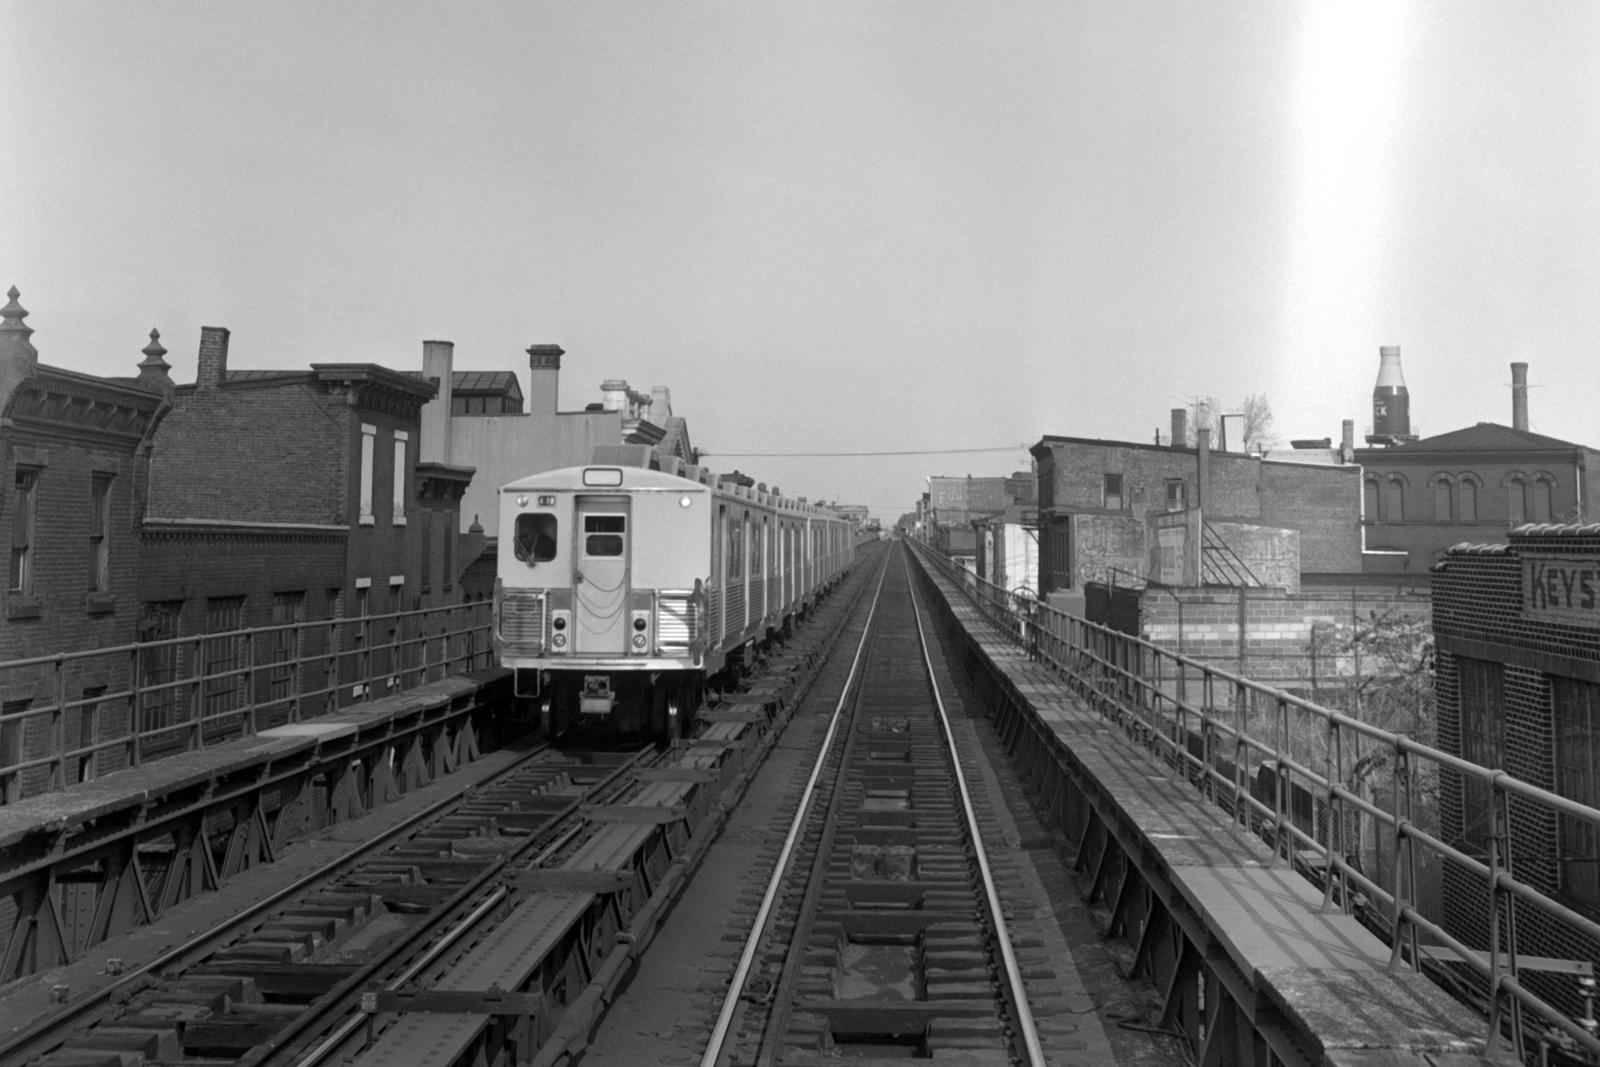 (466k, 1600x1067)<br><b>Country:</b> United States<br><b>City:</b> Philadelphia, PA<br><b>System:</b> SEPTA (or Predecessor)<br><b>Line:</b> Market-Frankford El<br><b>Location:</b> Berks<br><b>Car:</b> SEPTA M-3 (Budd, 1960)  <br><b>Collection of:</b> David Pirmann<br><b>Date:</b> 10/28/1967<br><b>Viewed (this week/total):</b> 0 / 56